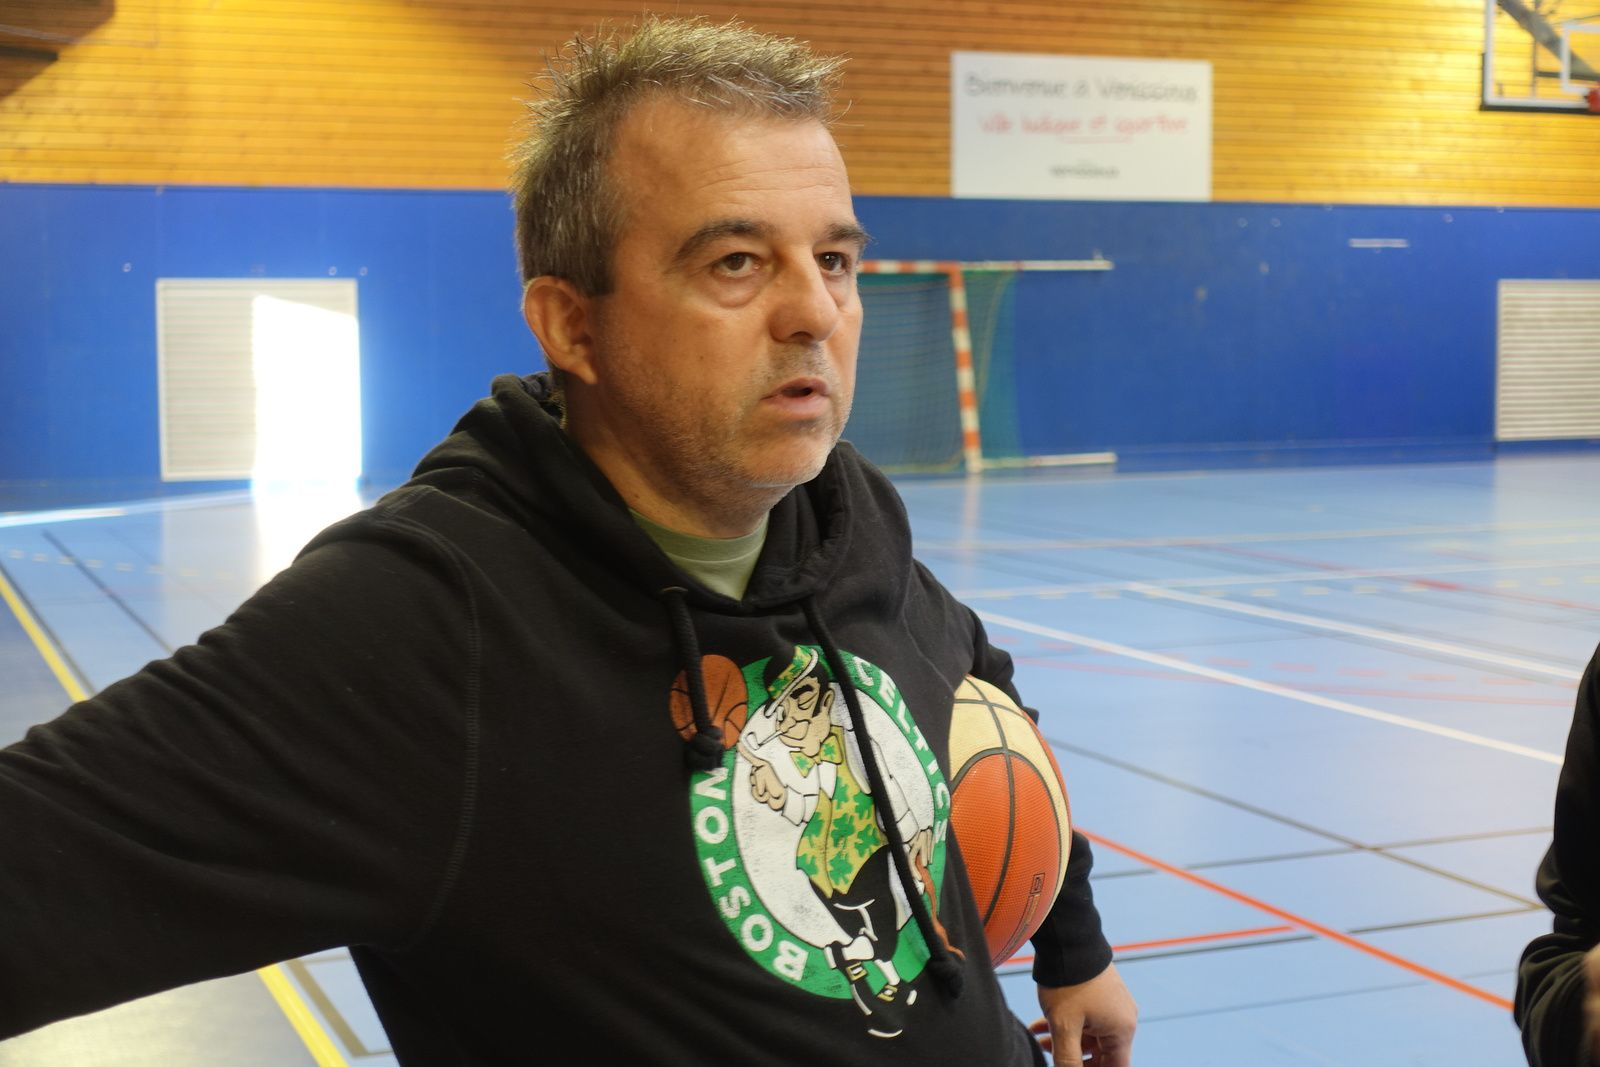 Christophe Chabroud (ALVP Basket féminin)